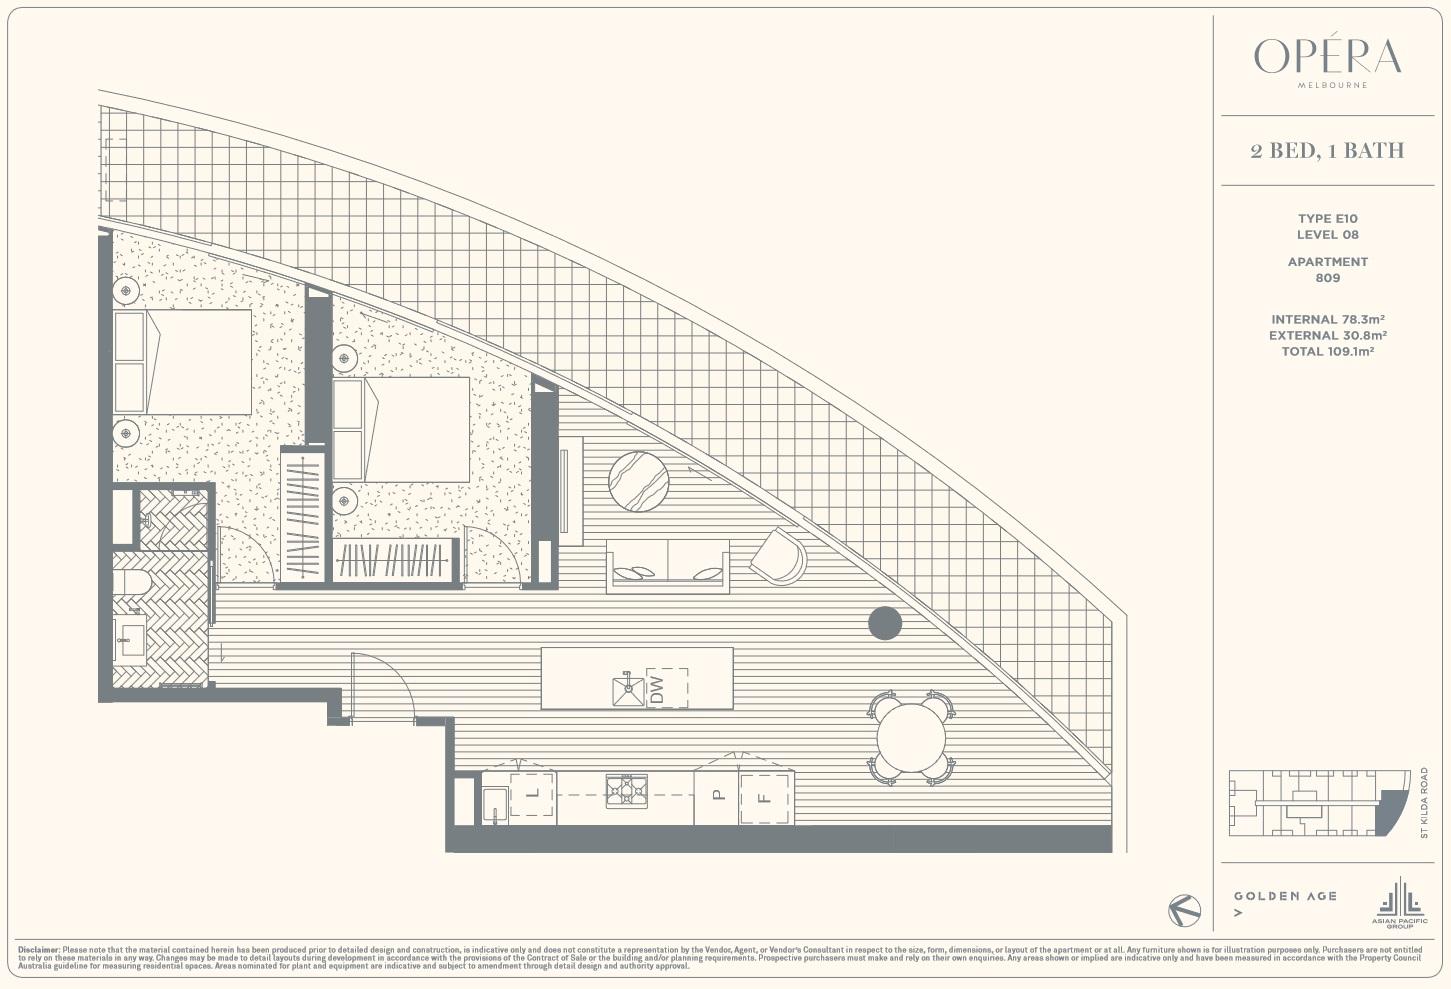 Floor Plan Type E10 - 2Bed1Bath